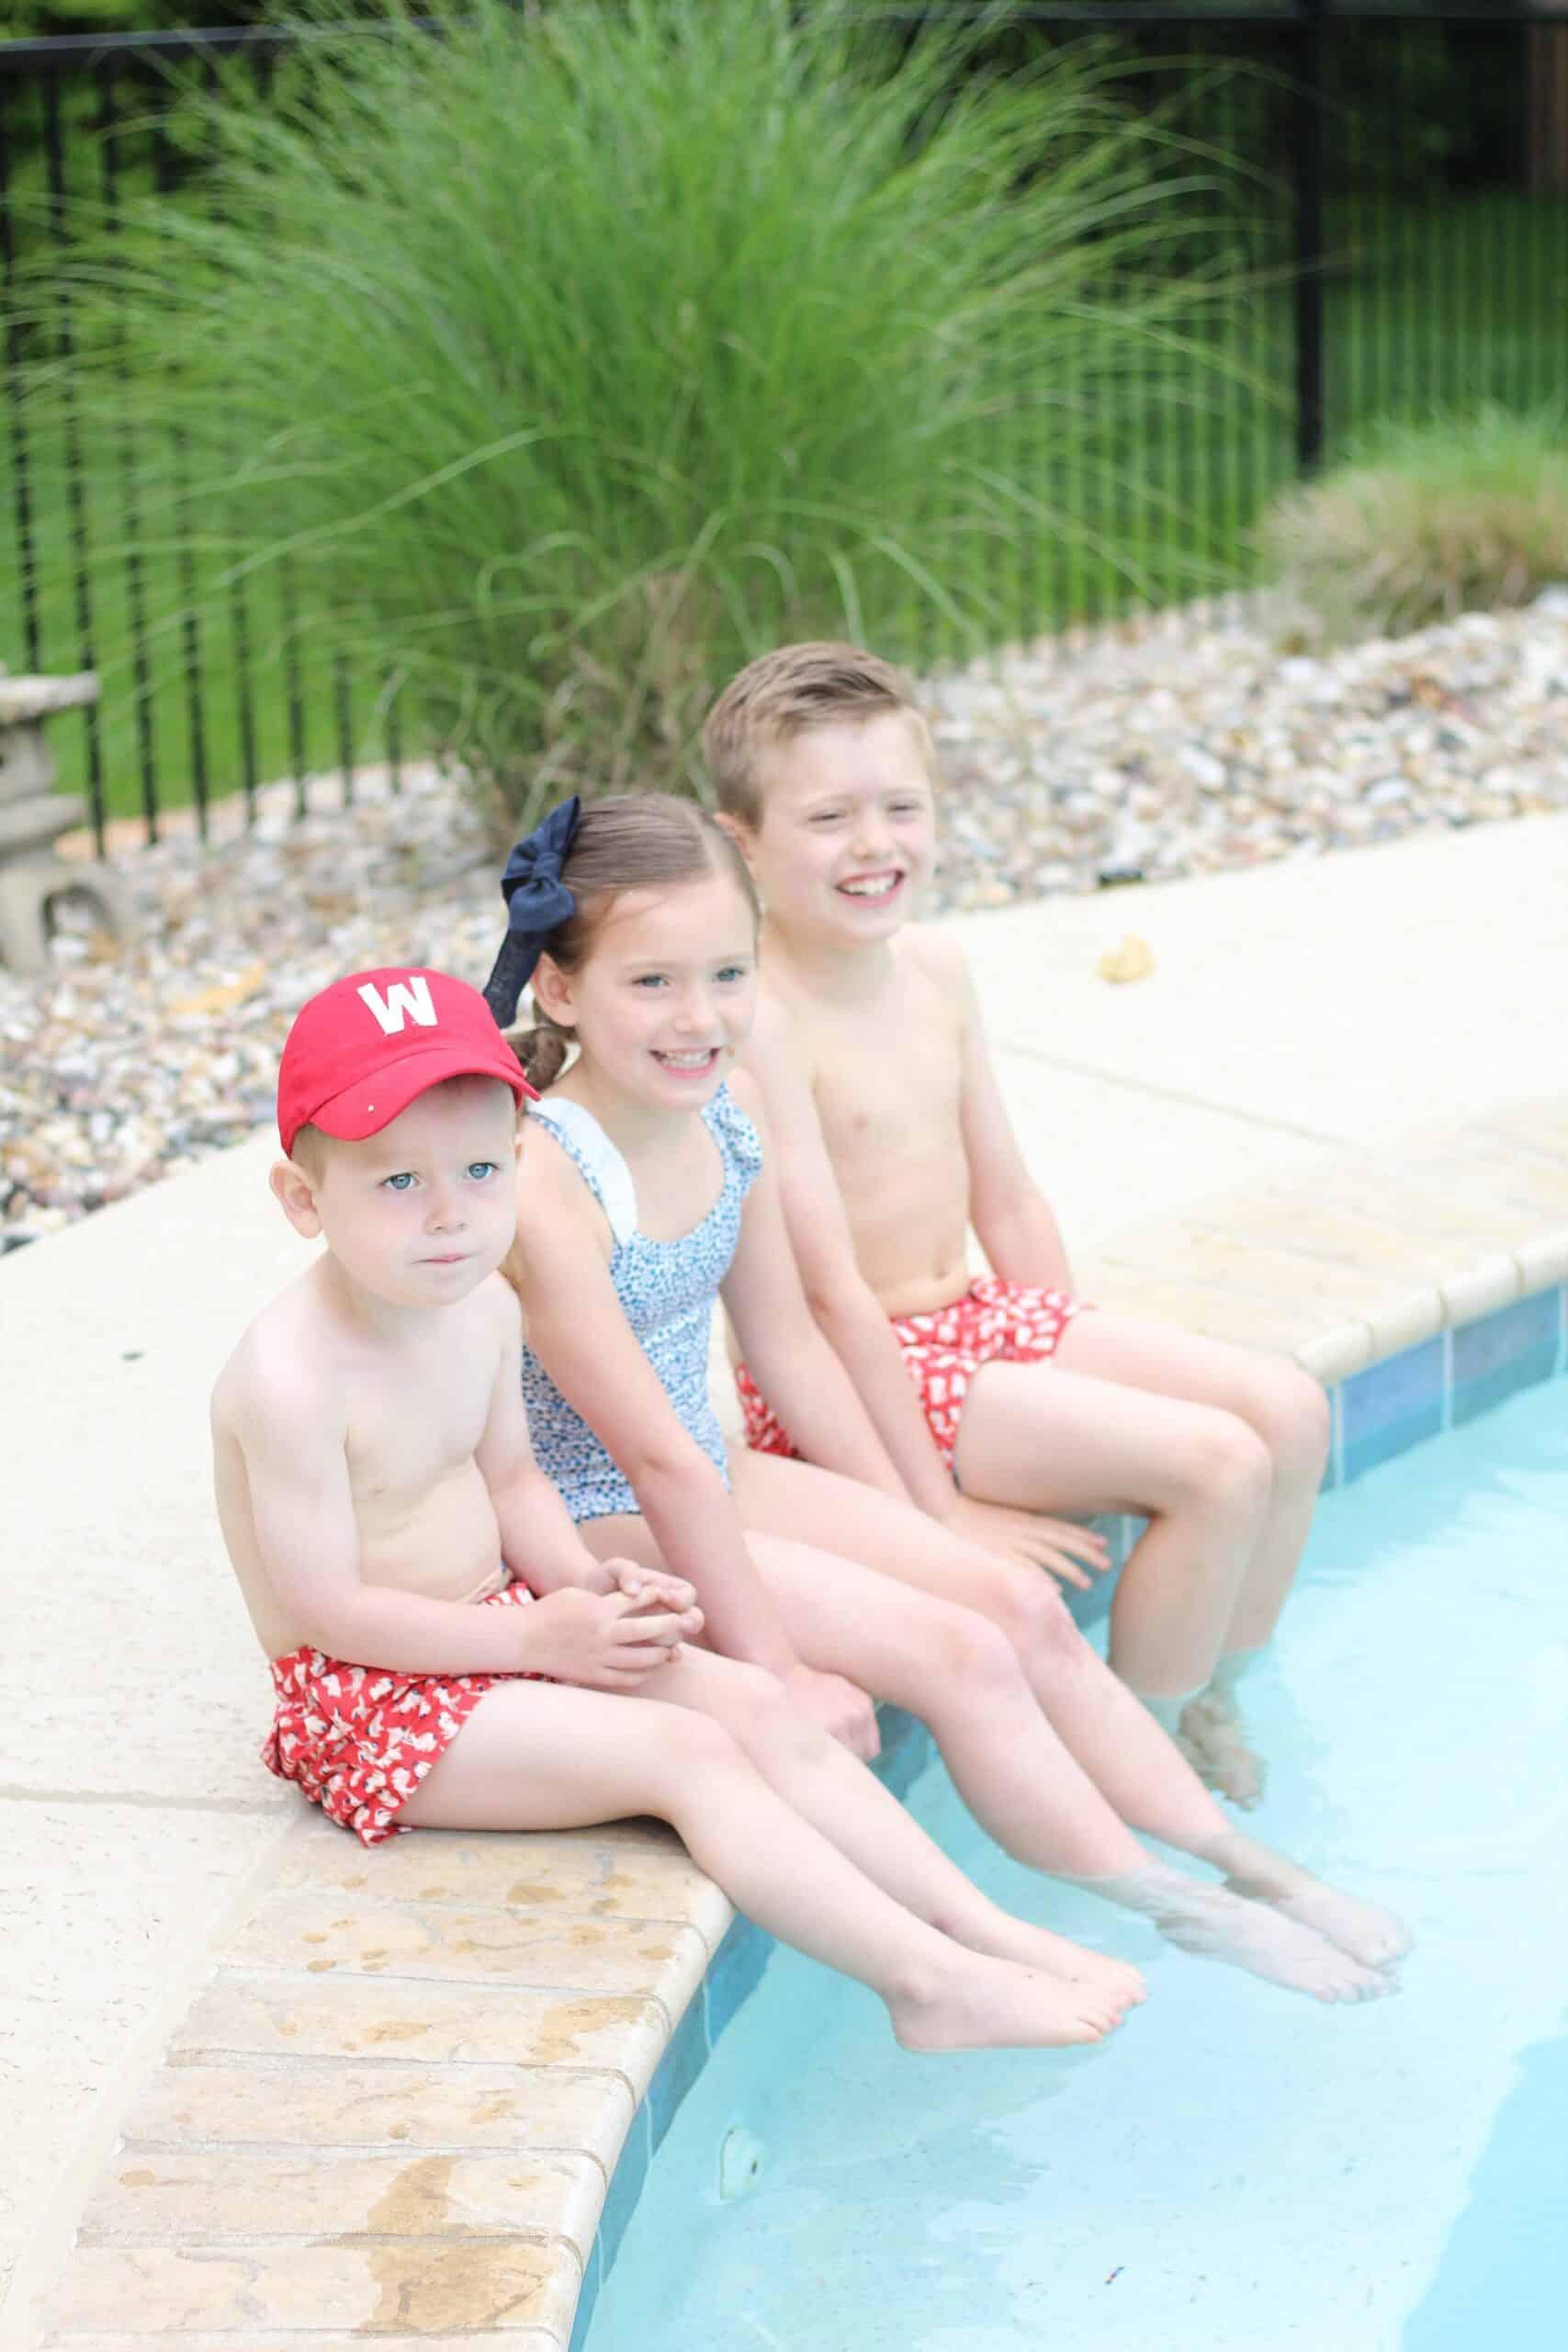 kids sitting pool side